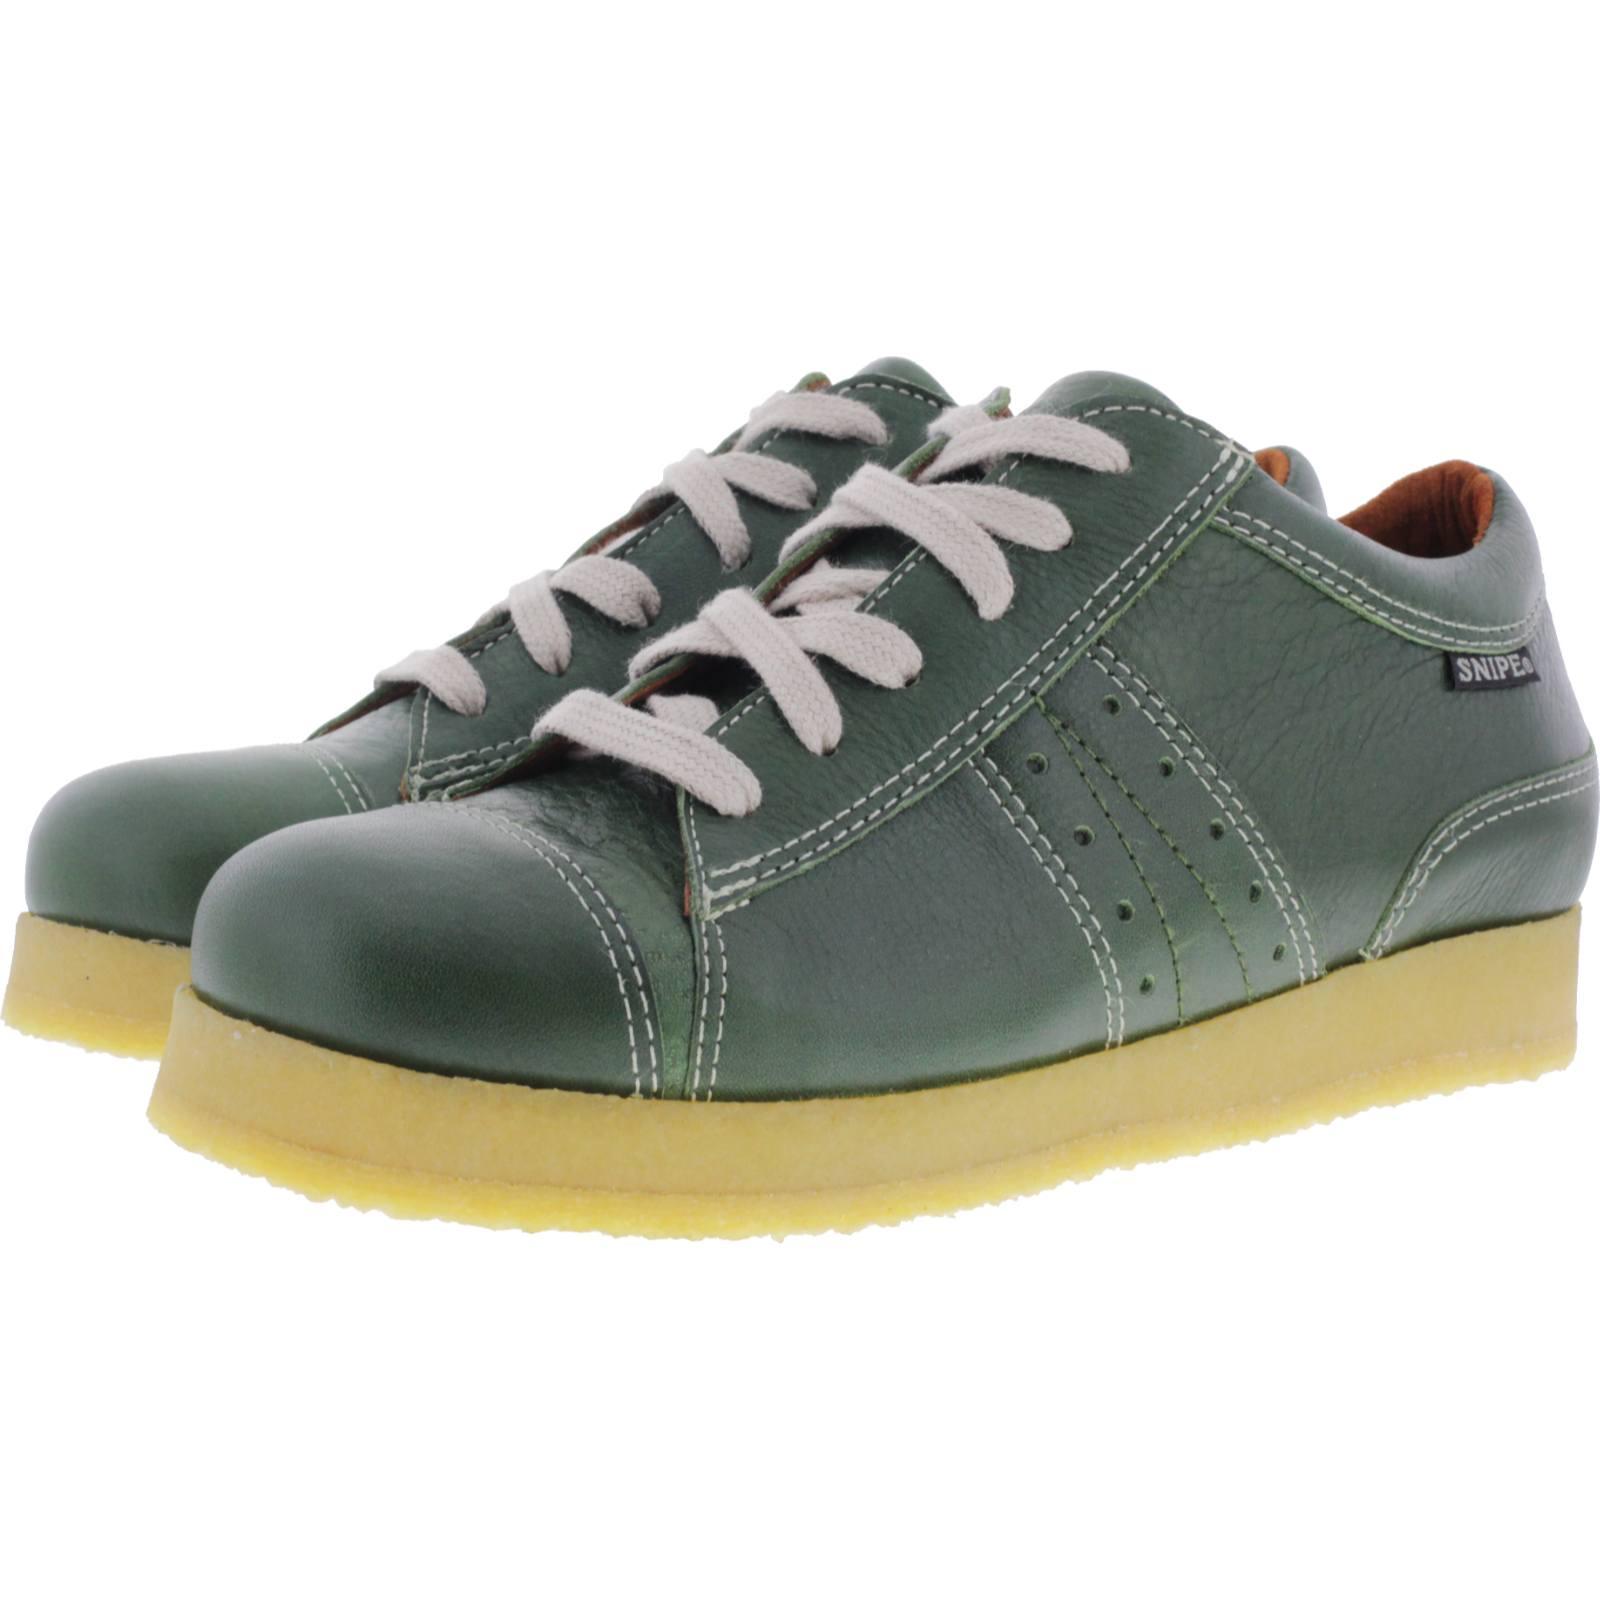 2104fabac697e7 Snipe Schuhe günstig kaufen - Snipe Schuhe Online Shop